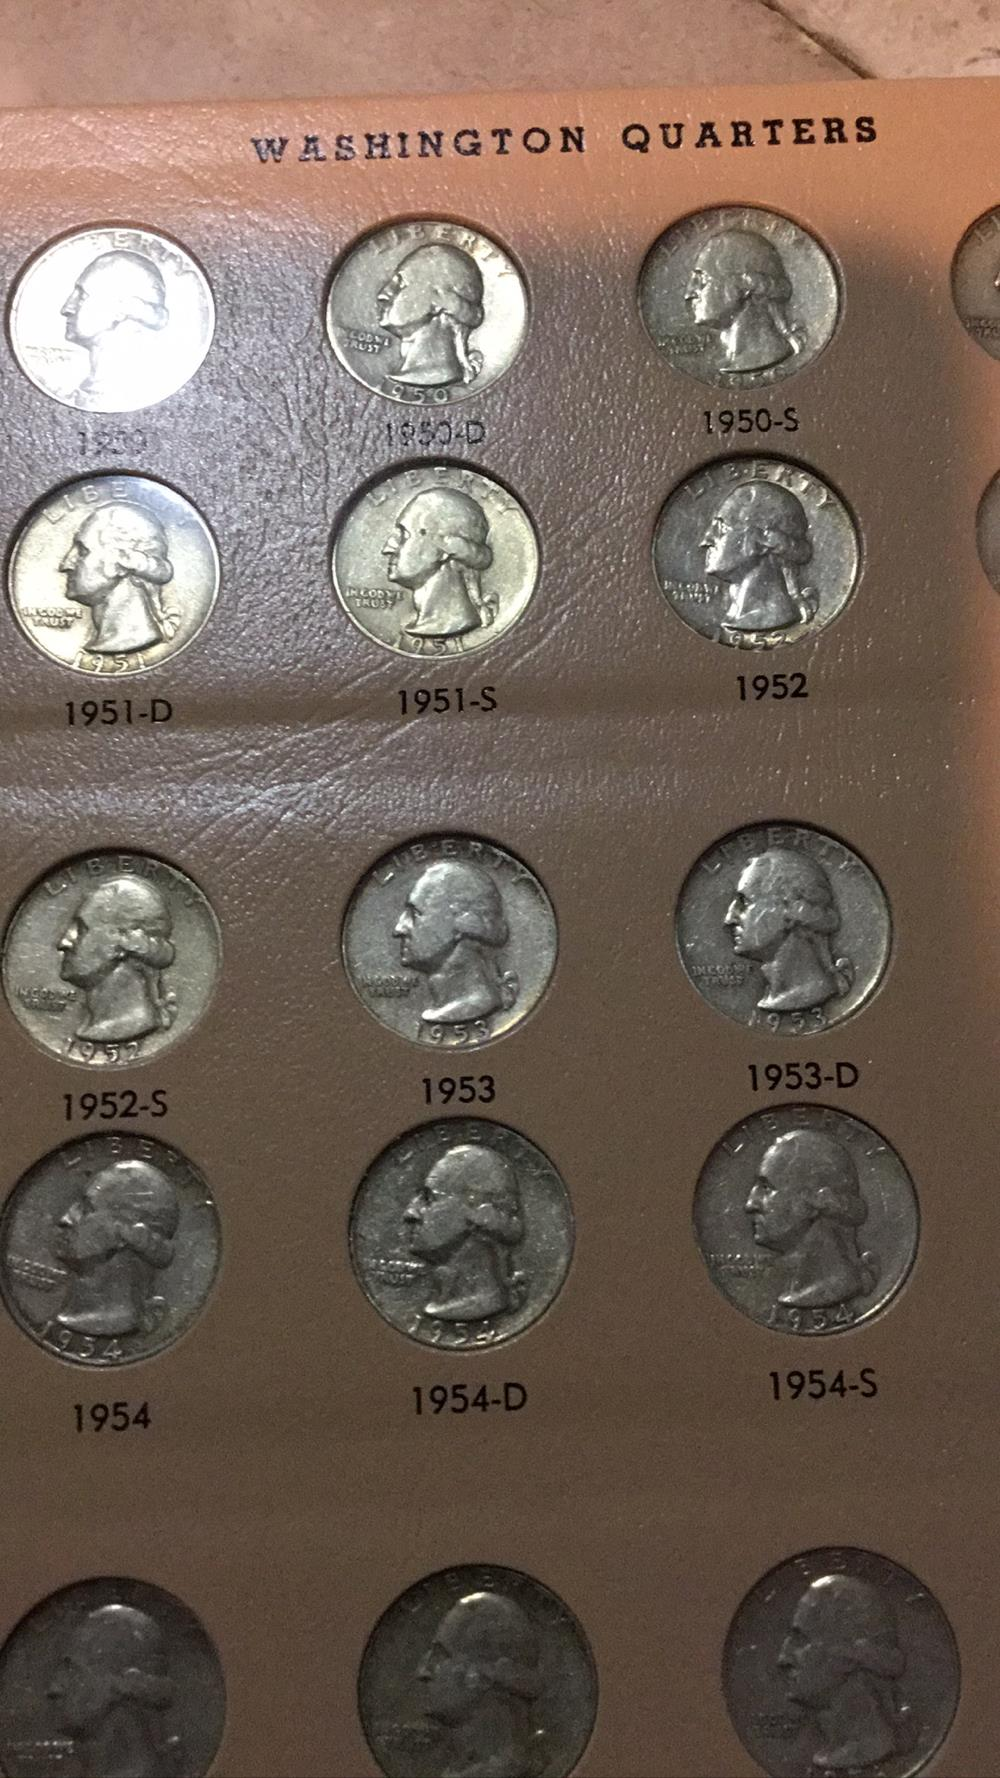 Lot 194: Washington quarters sheet